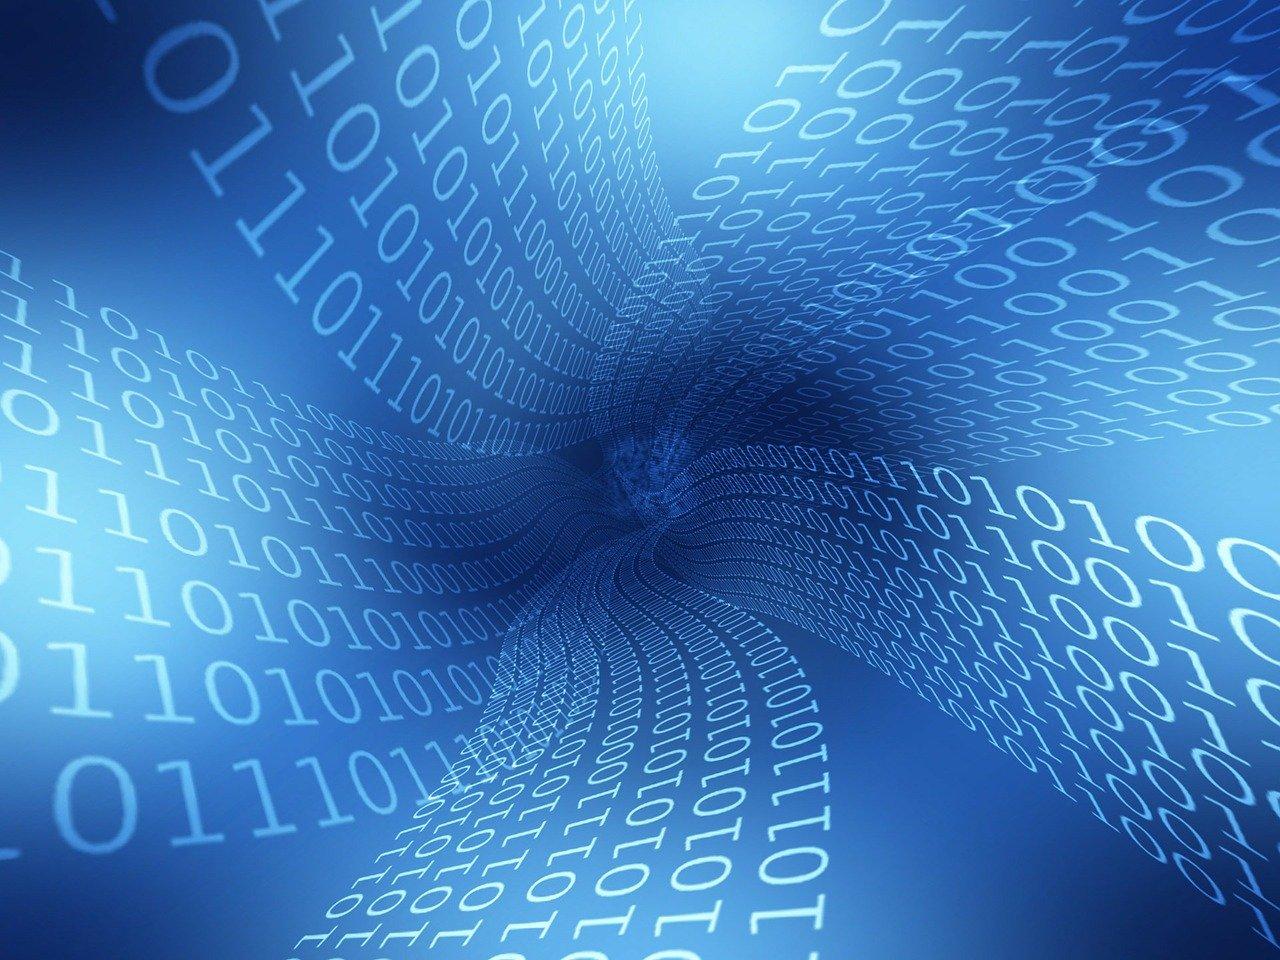 ■AIの学習データとは?|人工知能を搭載した製品・サービスの比較一覧・導入活用事例・資料請求が無料でできるAIポータルメディア